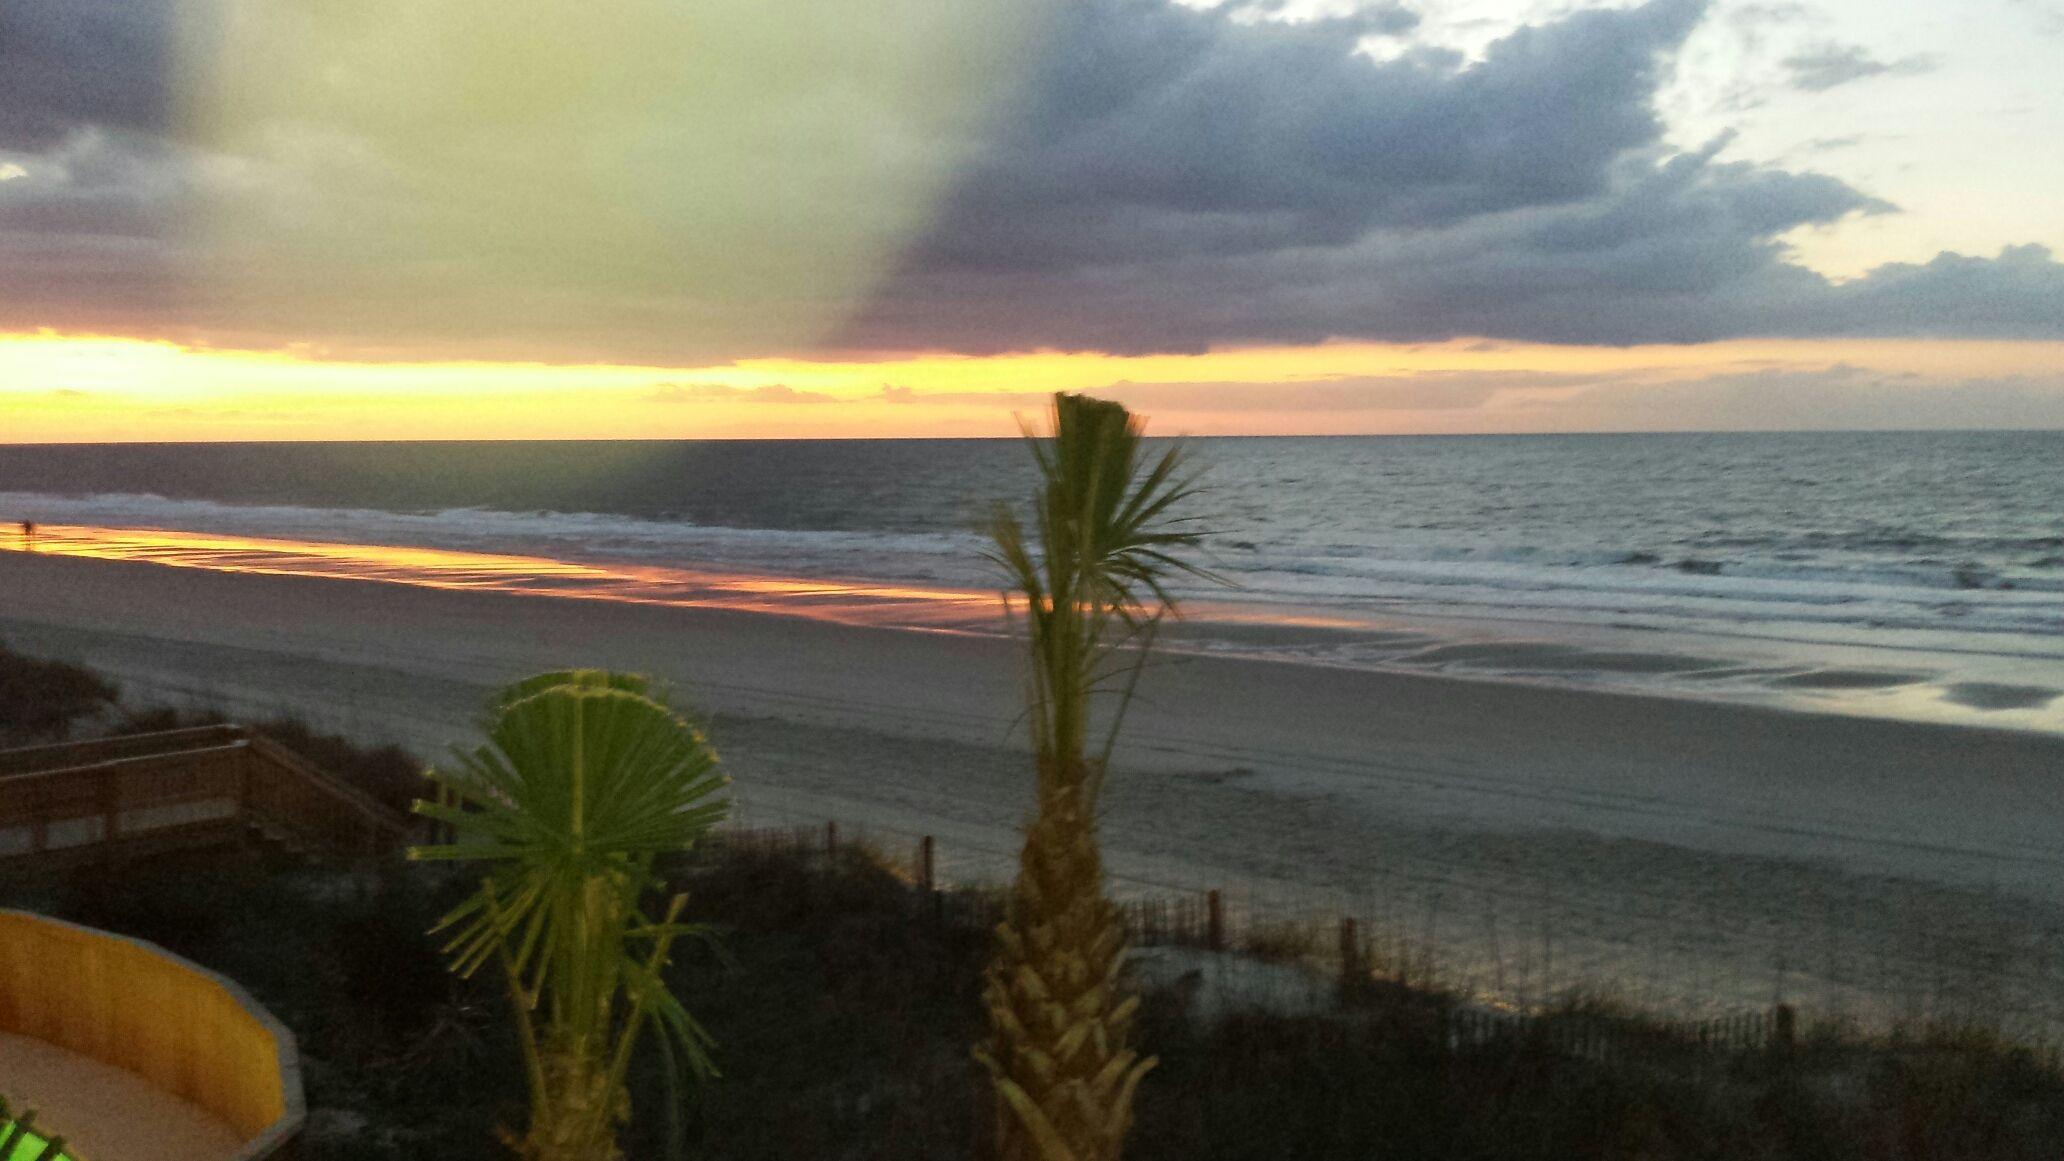 Sunrise (With images) Garden city beach, Condo interior